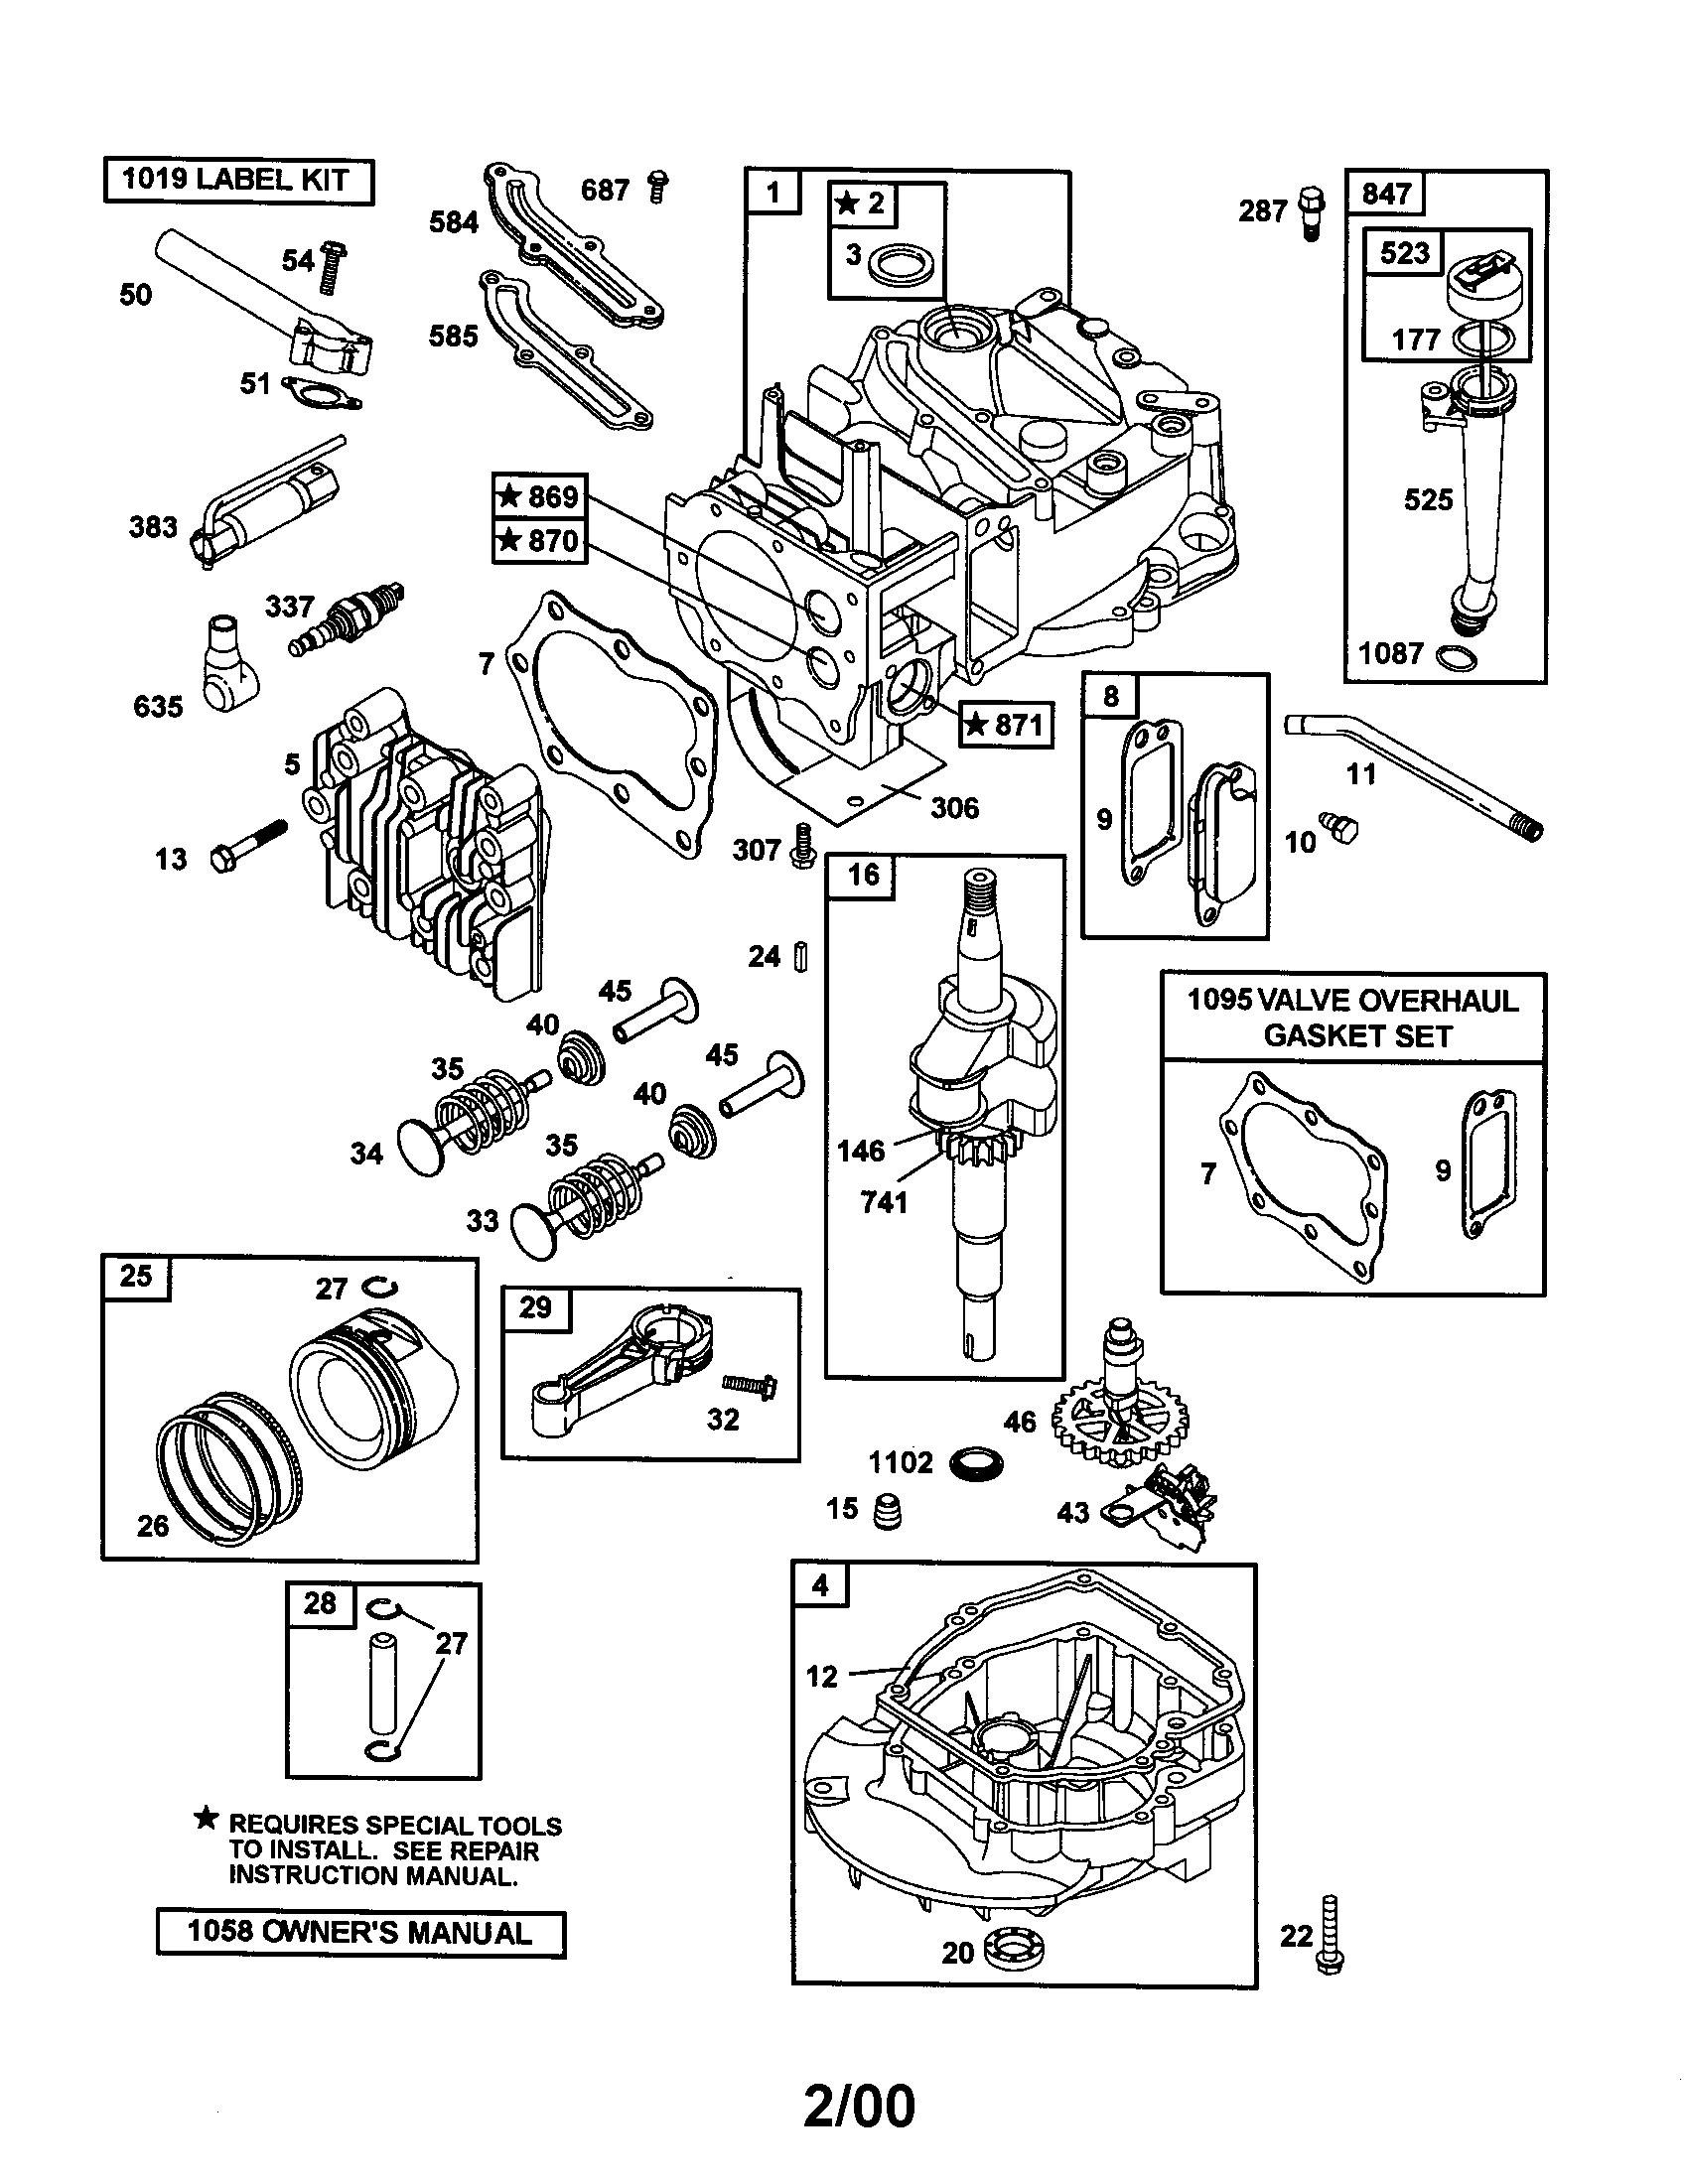 briggs and stratton sq40 manual ebook rh briggs and stratton sq40 manual ebook letigne briggs stratton quattro 40 service manual briggs & stratton - quattro 40 engine service manual